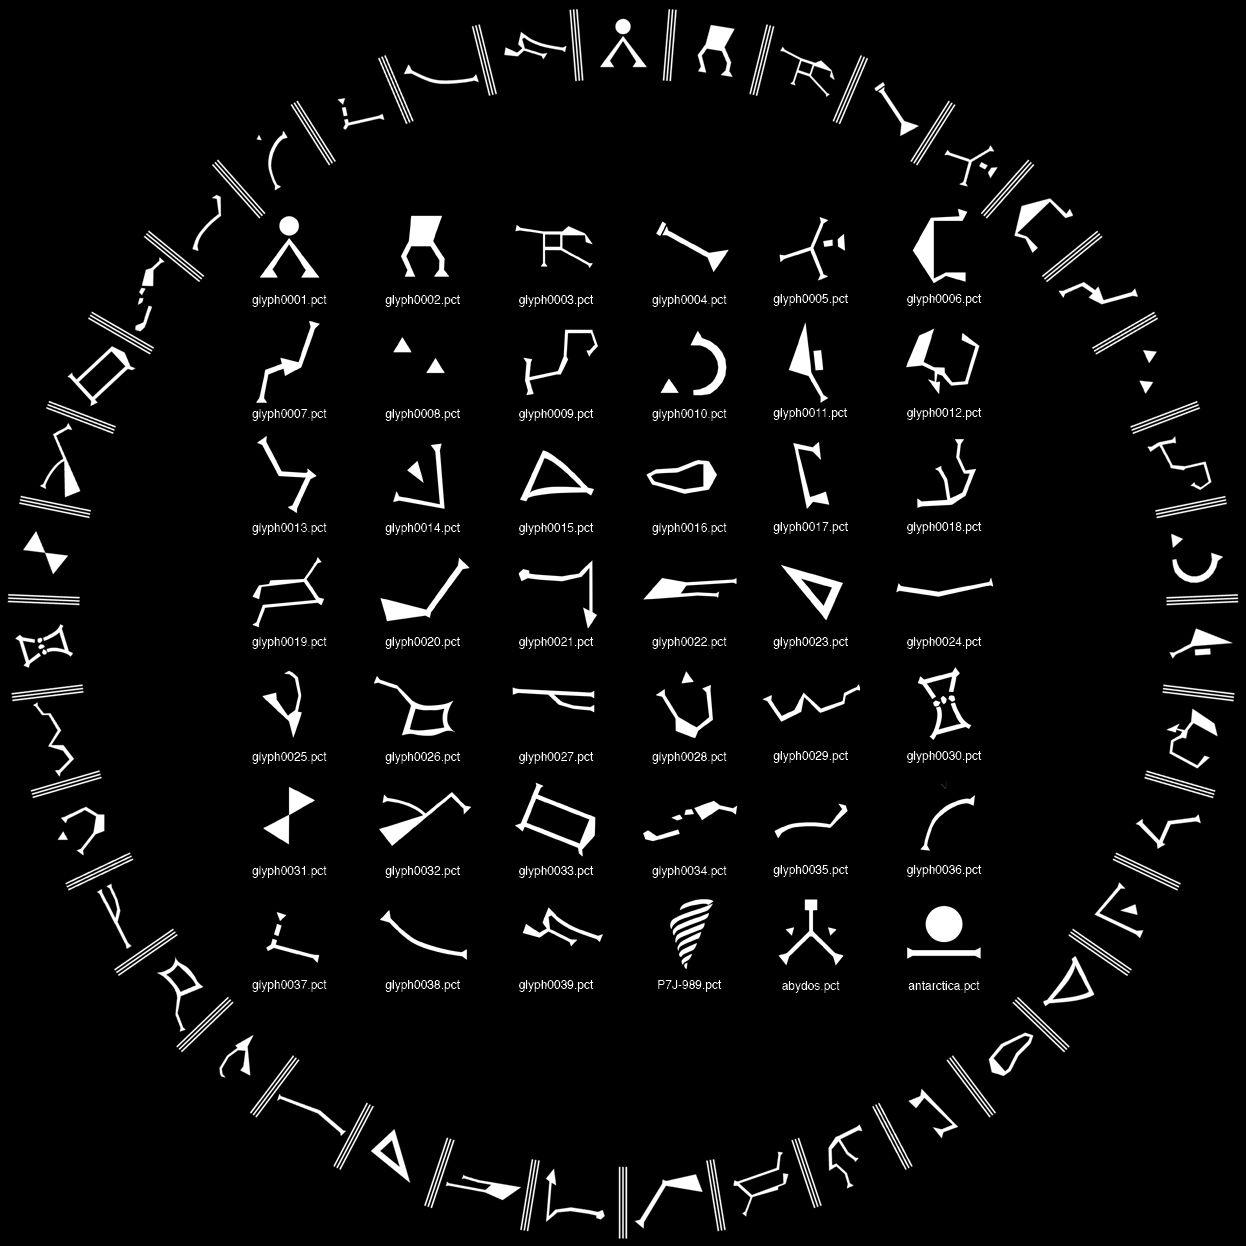 36 symbols or 39 symbols?